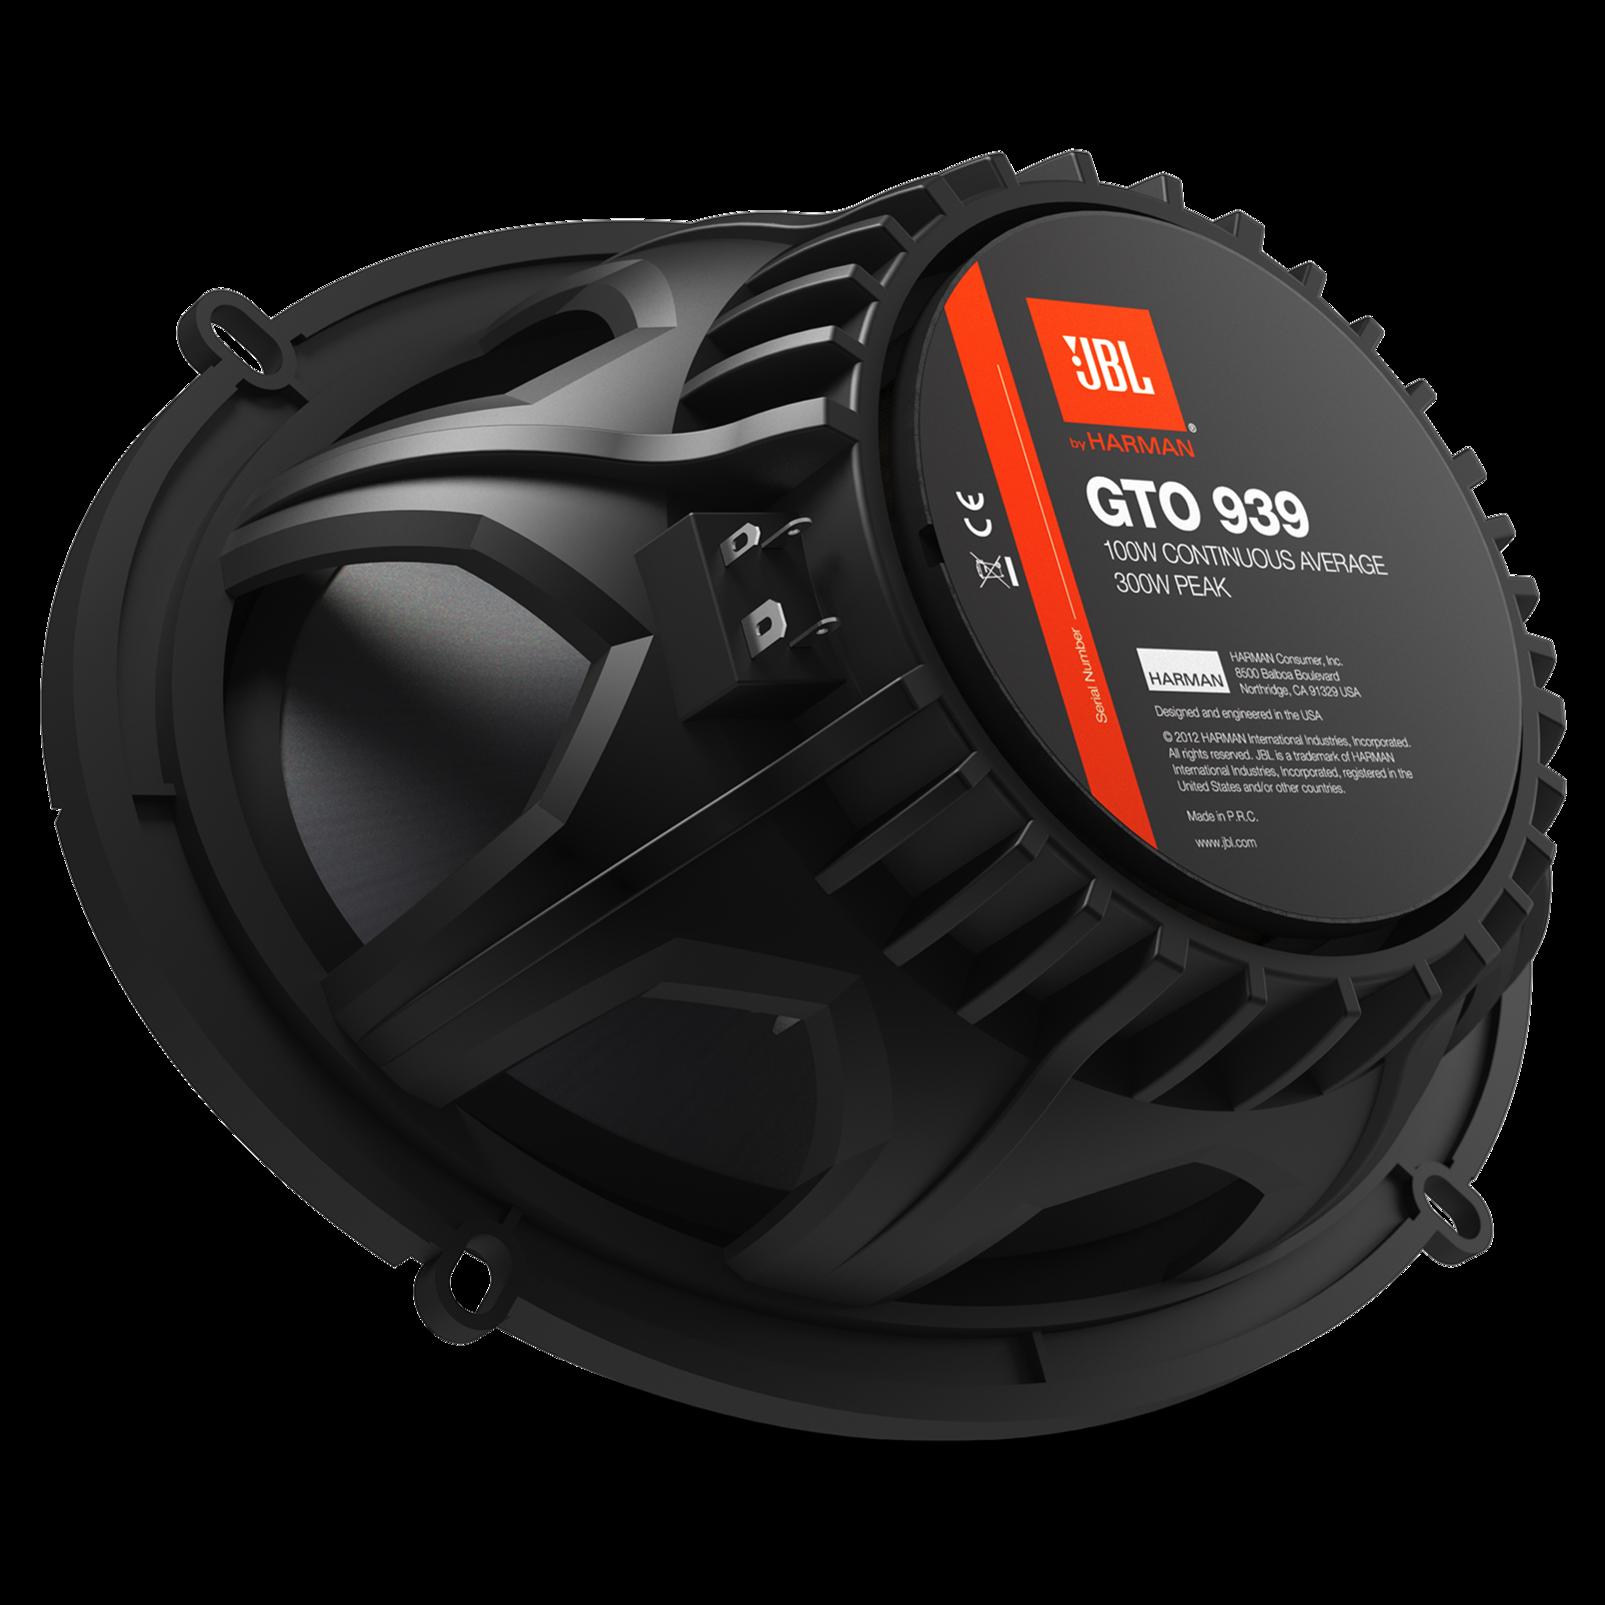 GTO939 Jbl Home Audio Wiring Diagram on